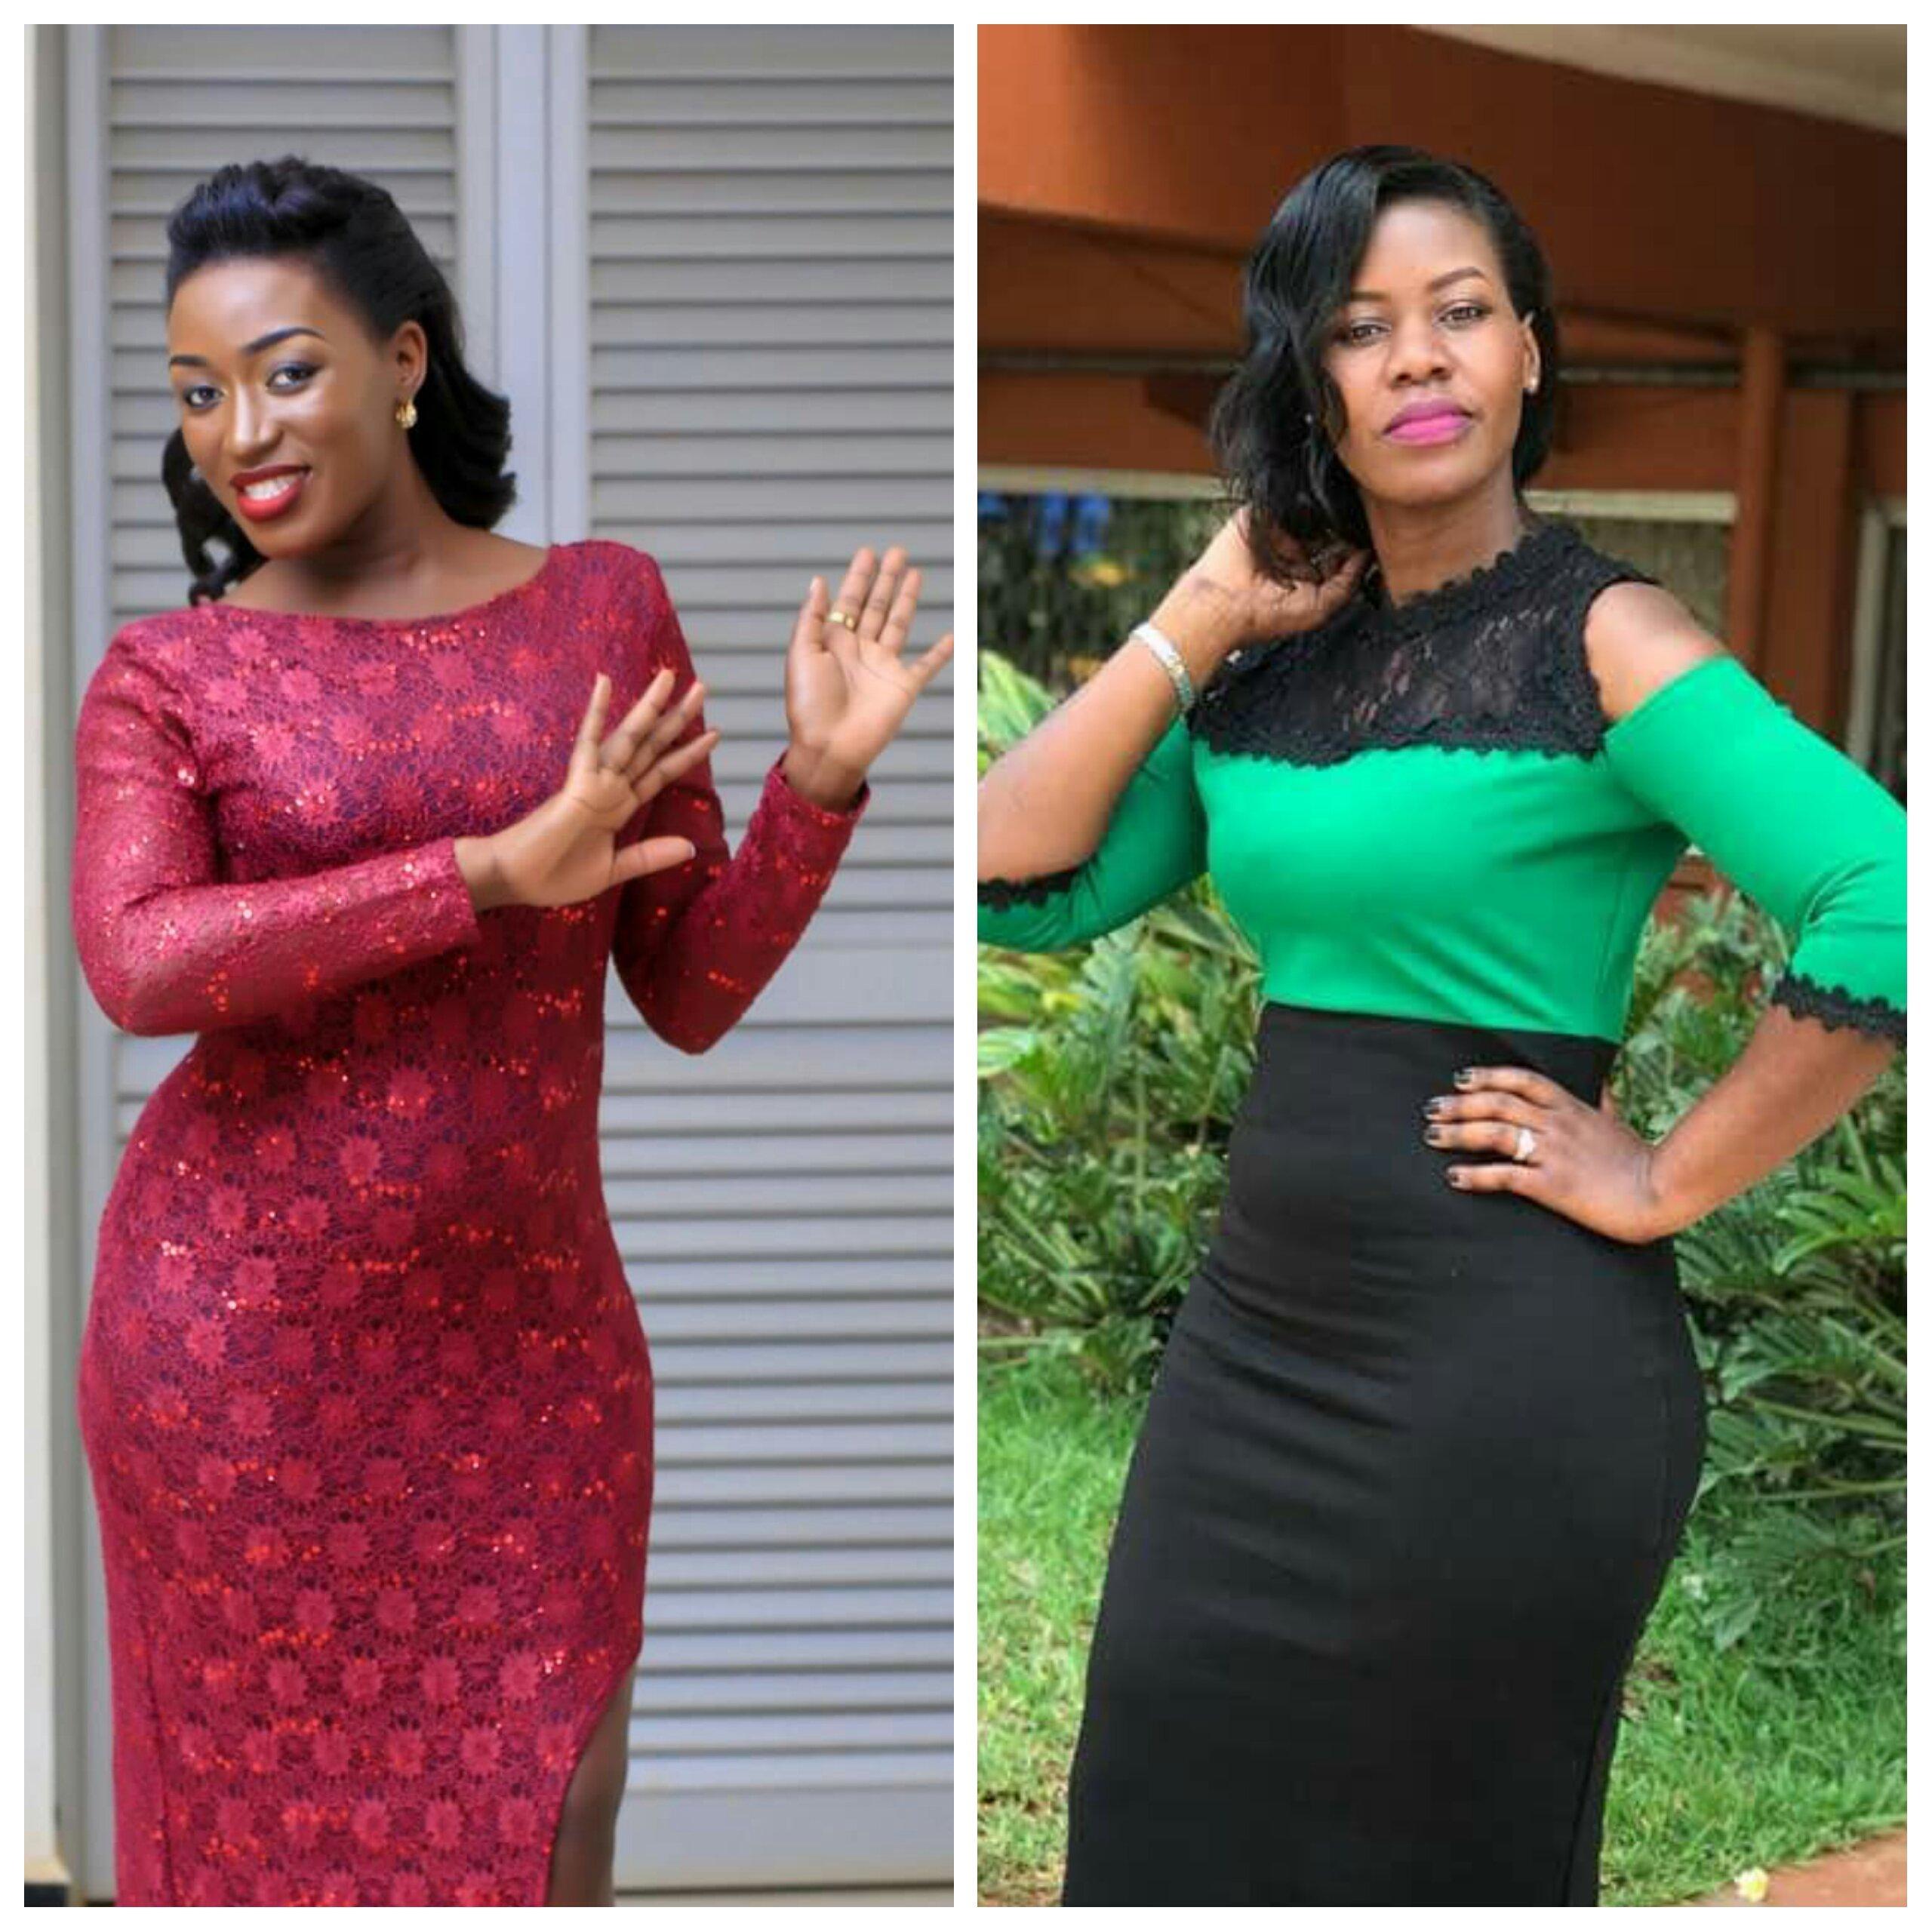 Justine Nameea responds to Faridah Nakazibwe